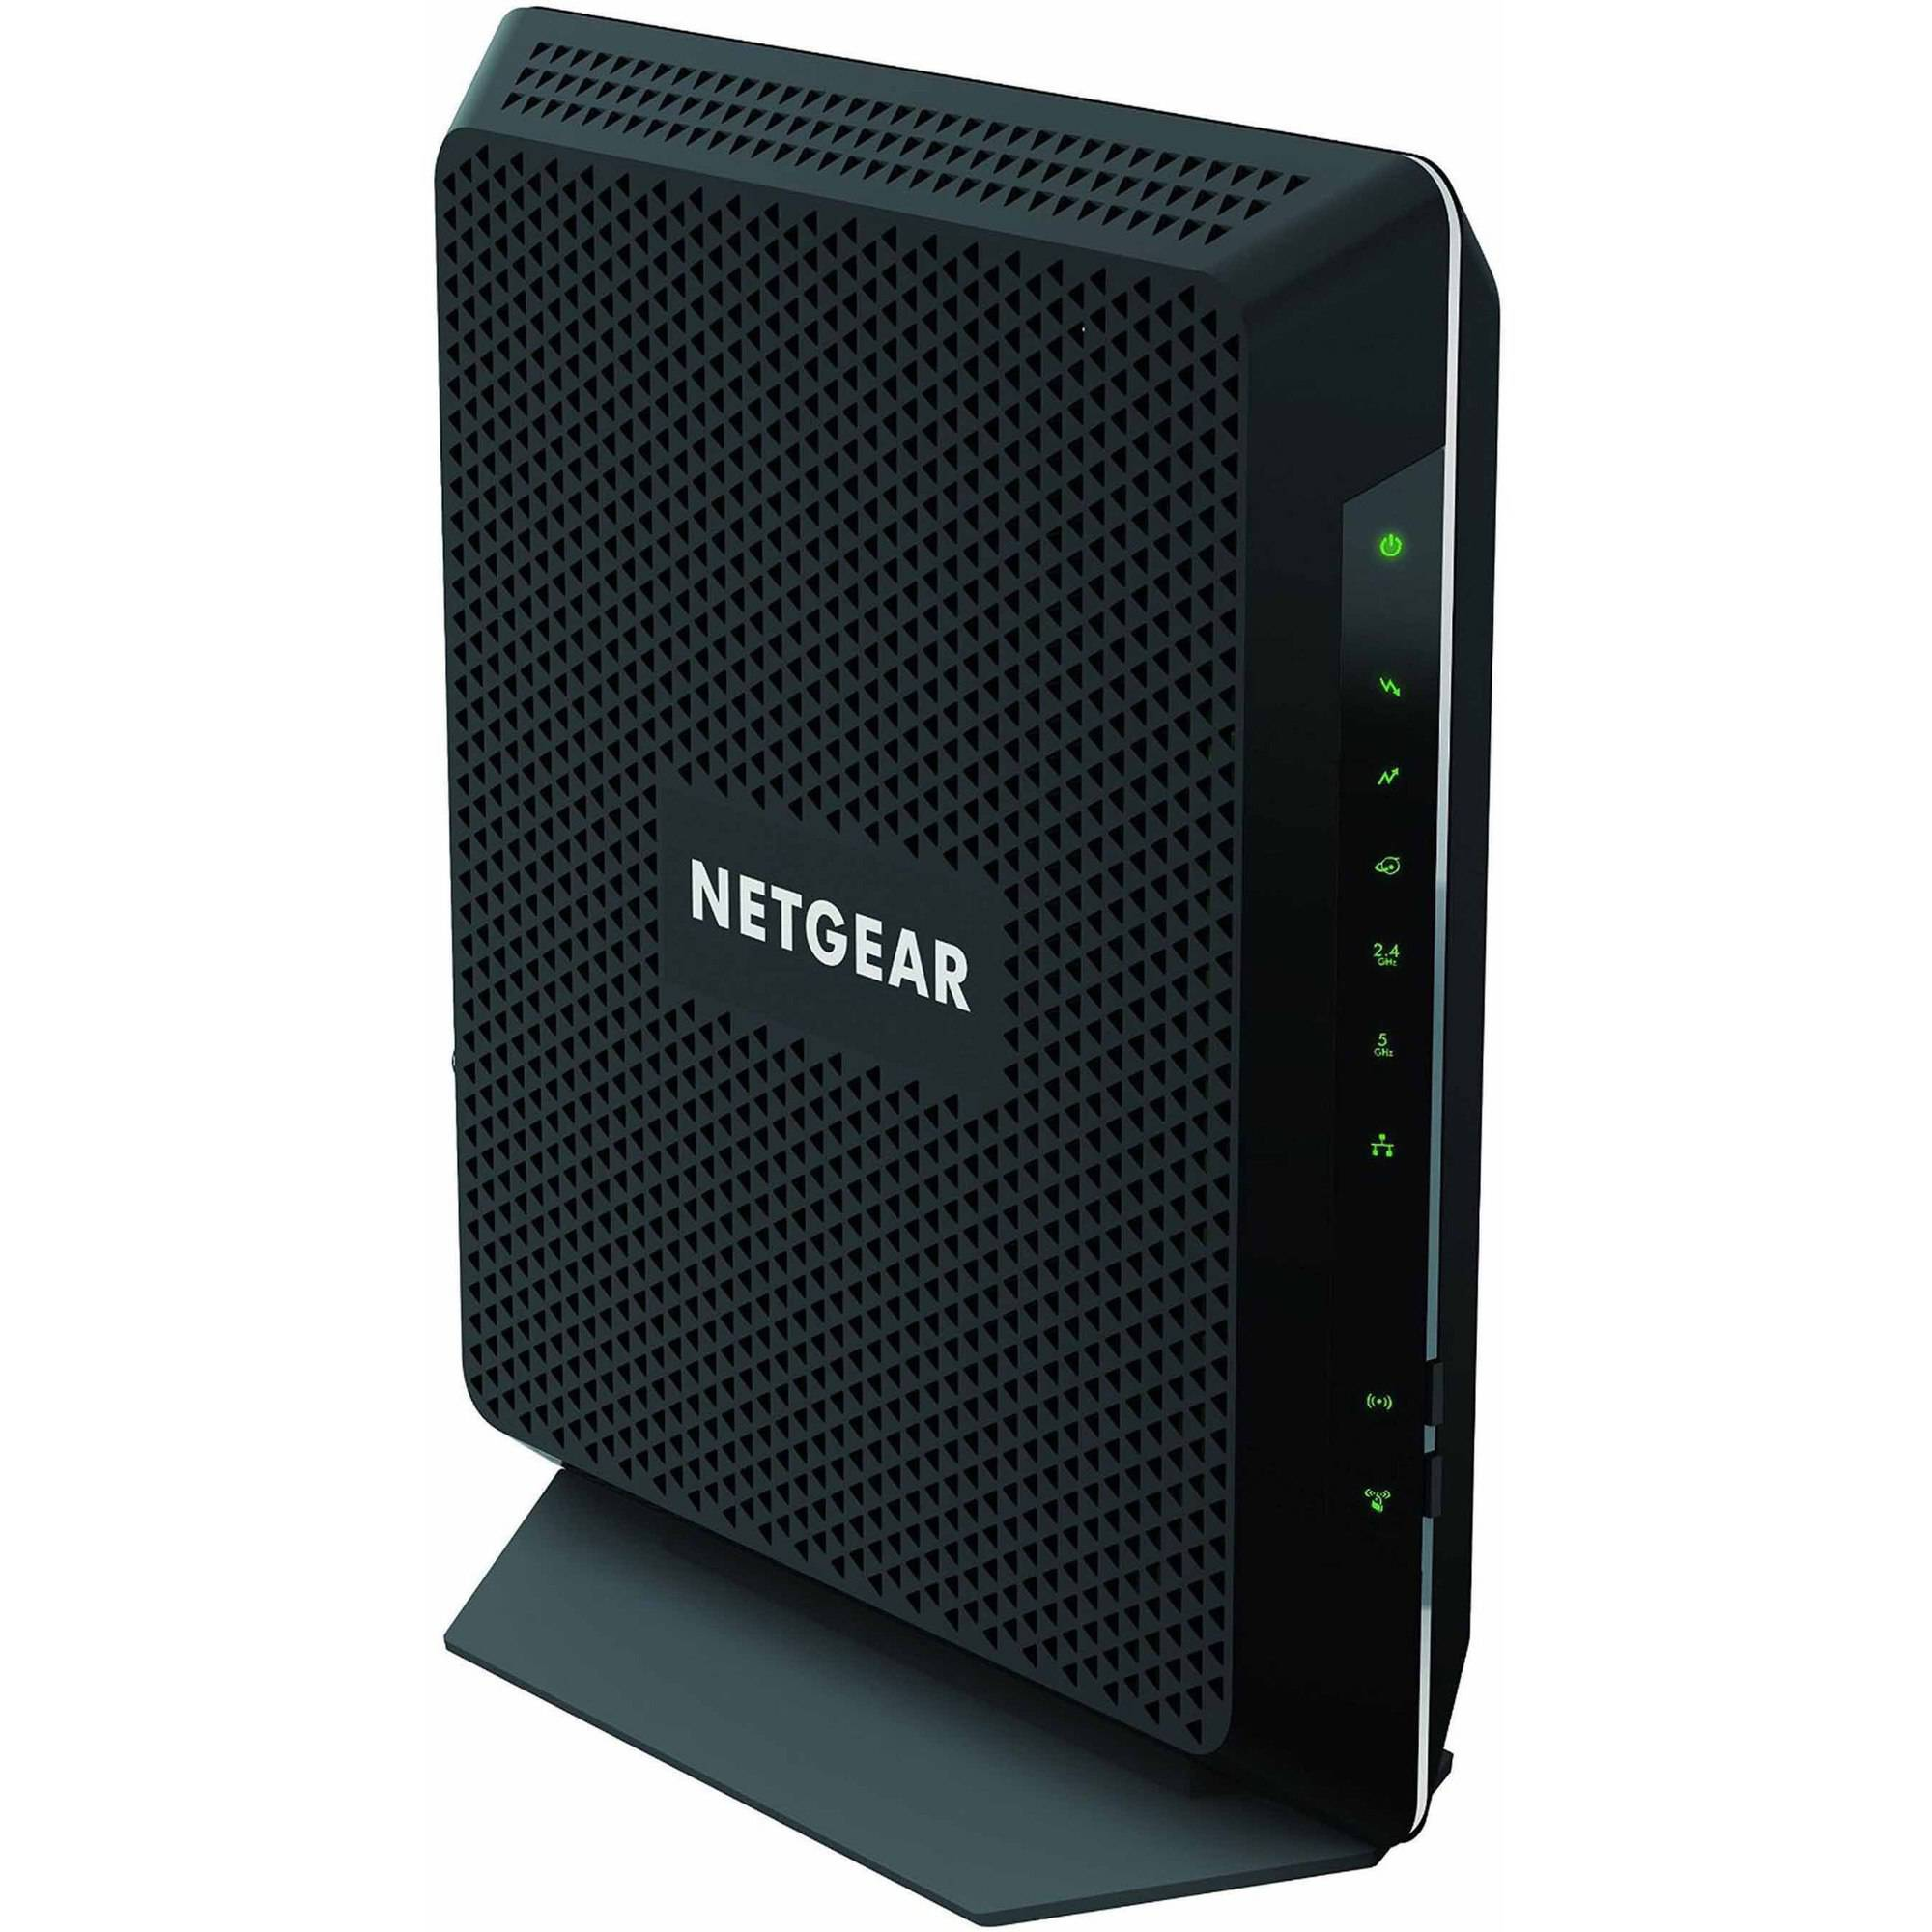 NETGEAR AC1900 Nighthawk WiFi Cable Modem Router (C7000)